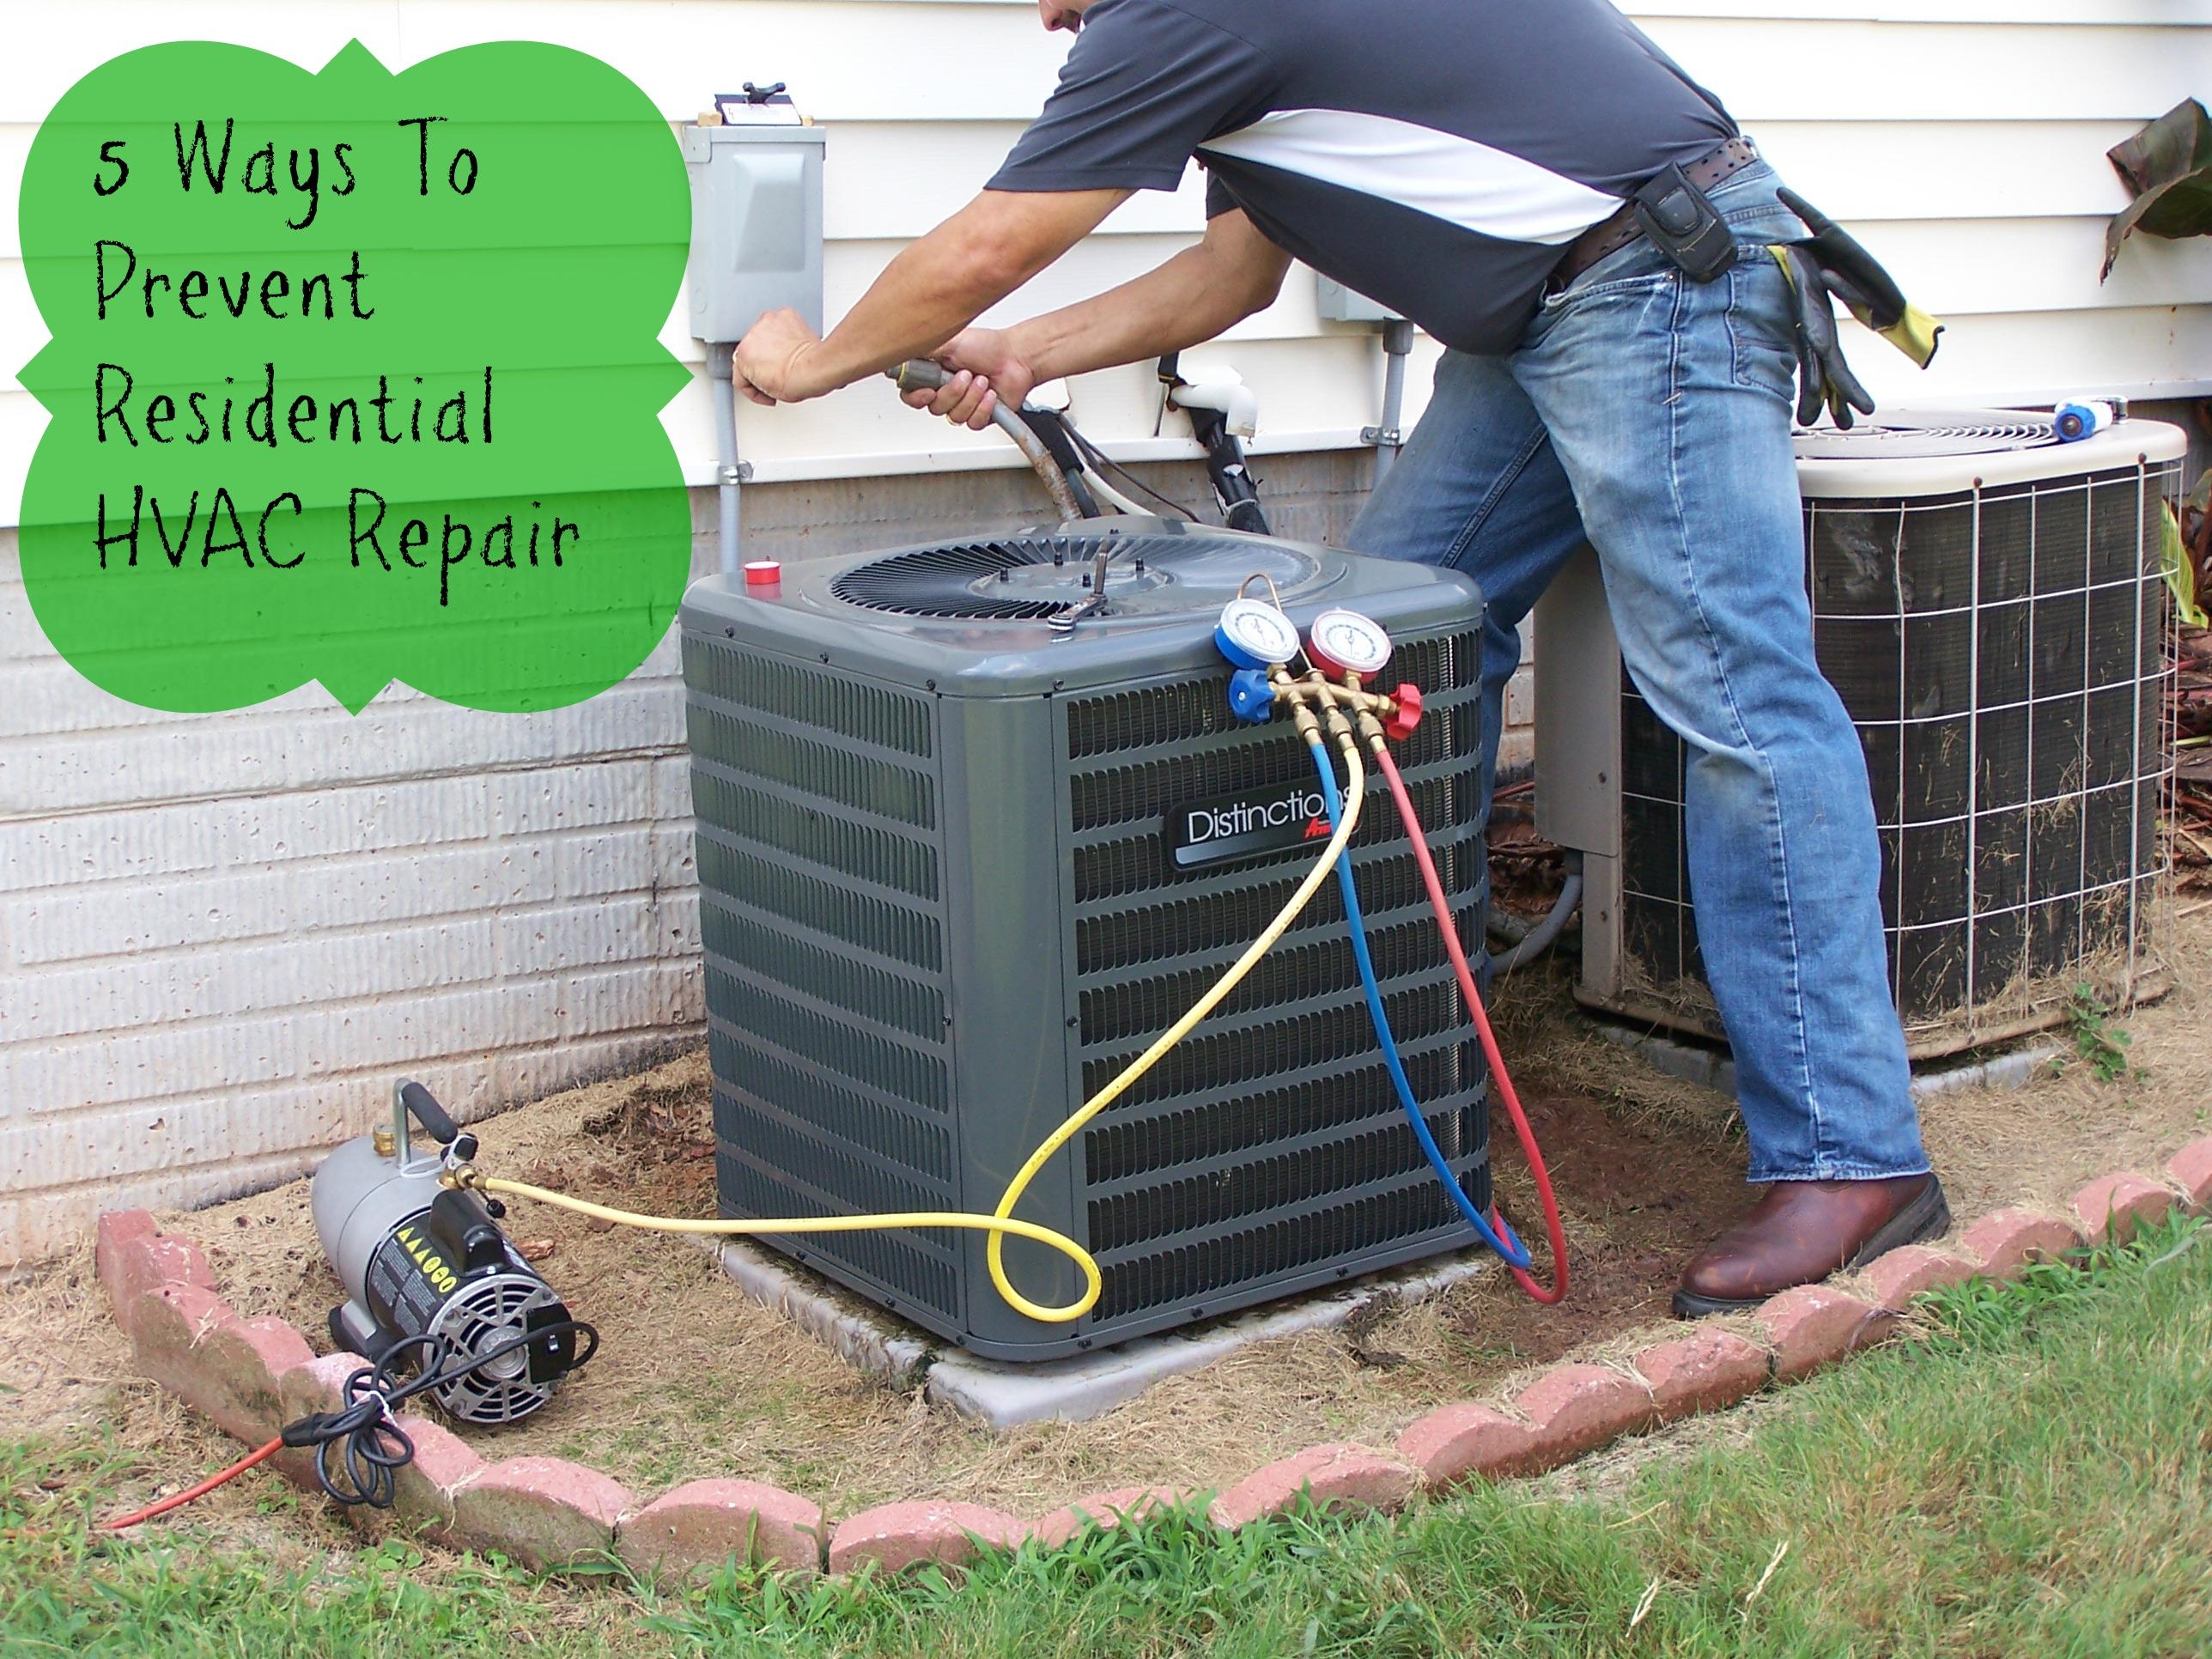 5 Ways To Prevent Residential HVAC Repair